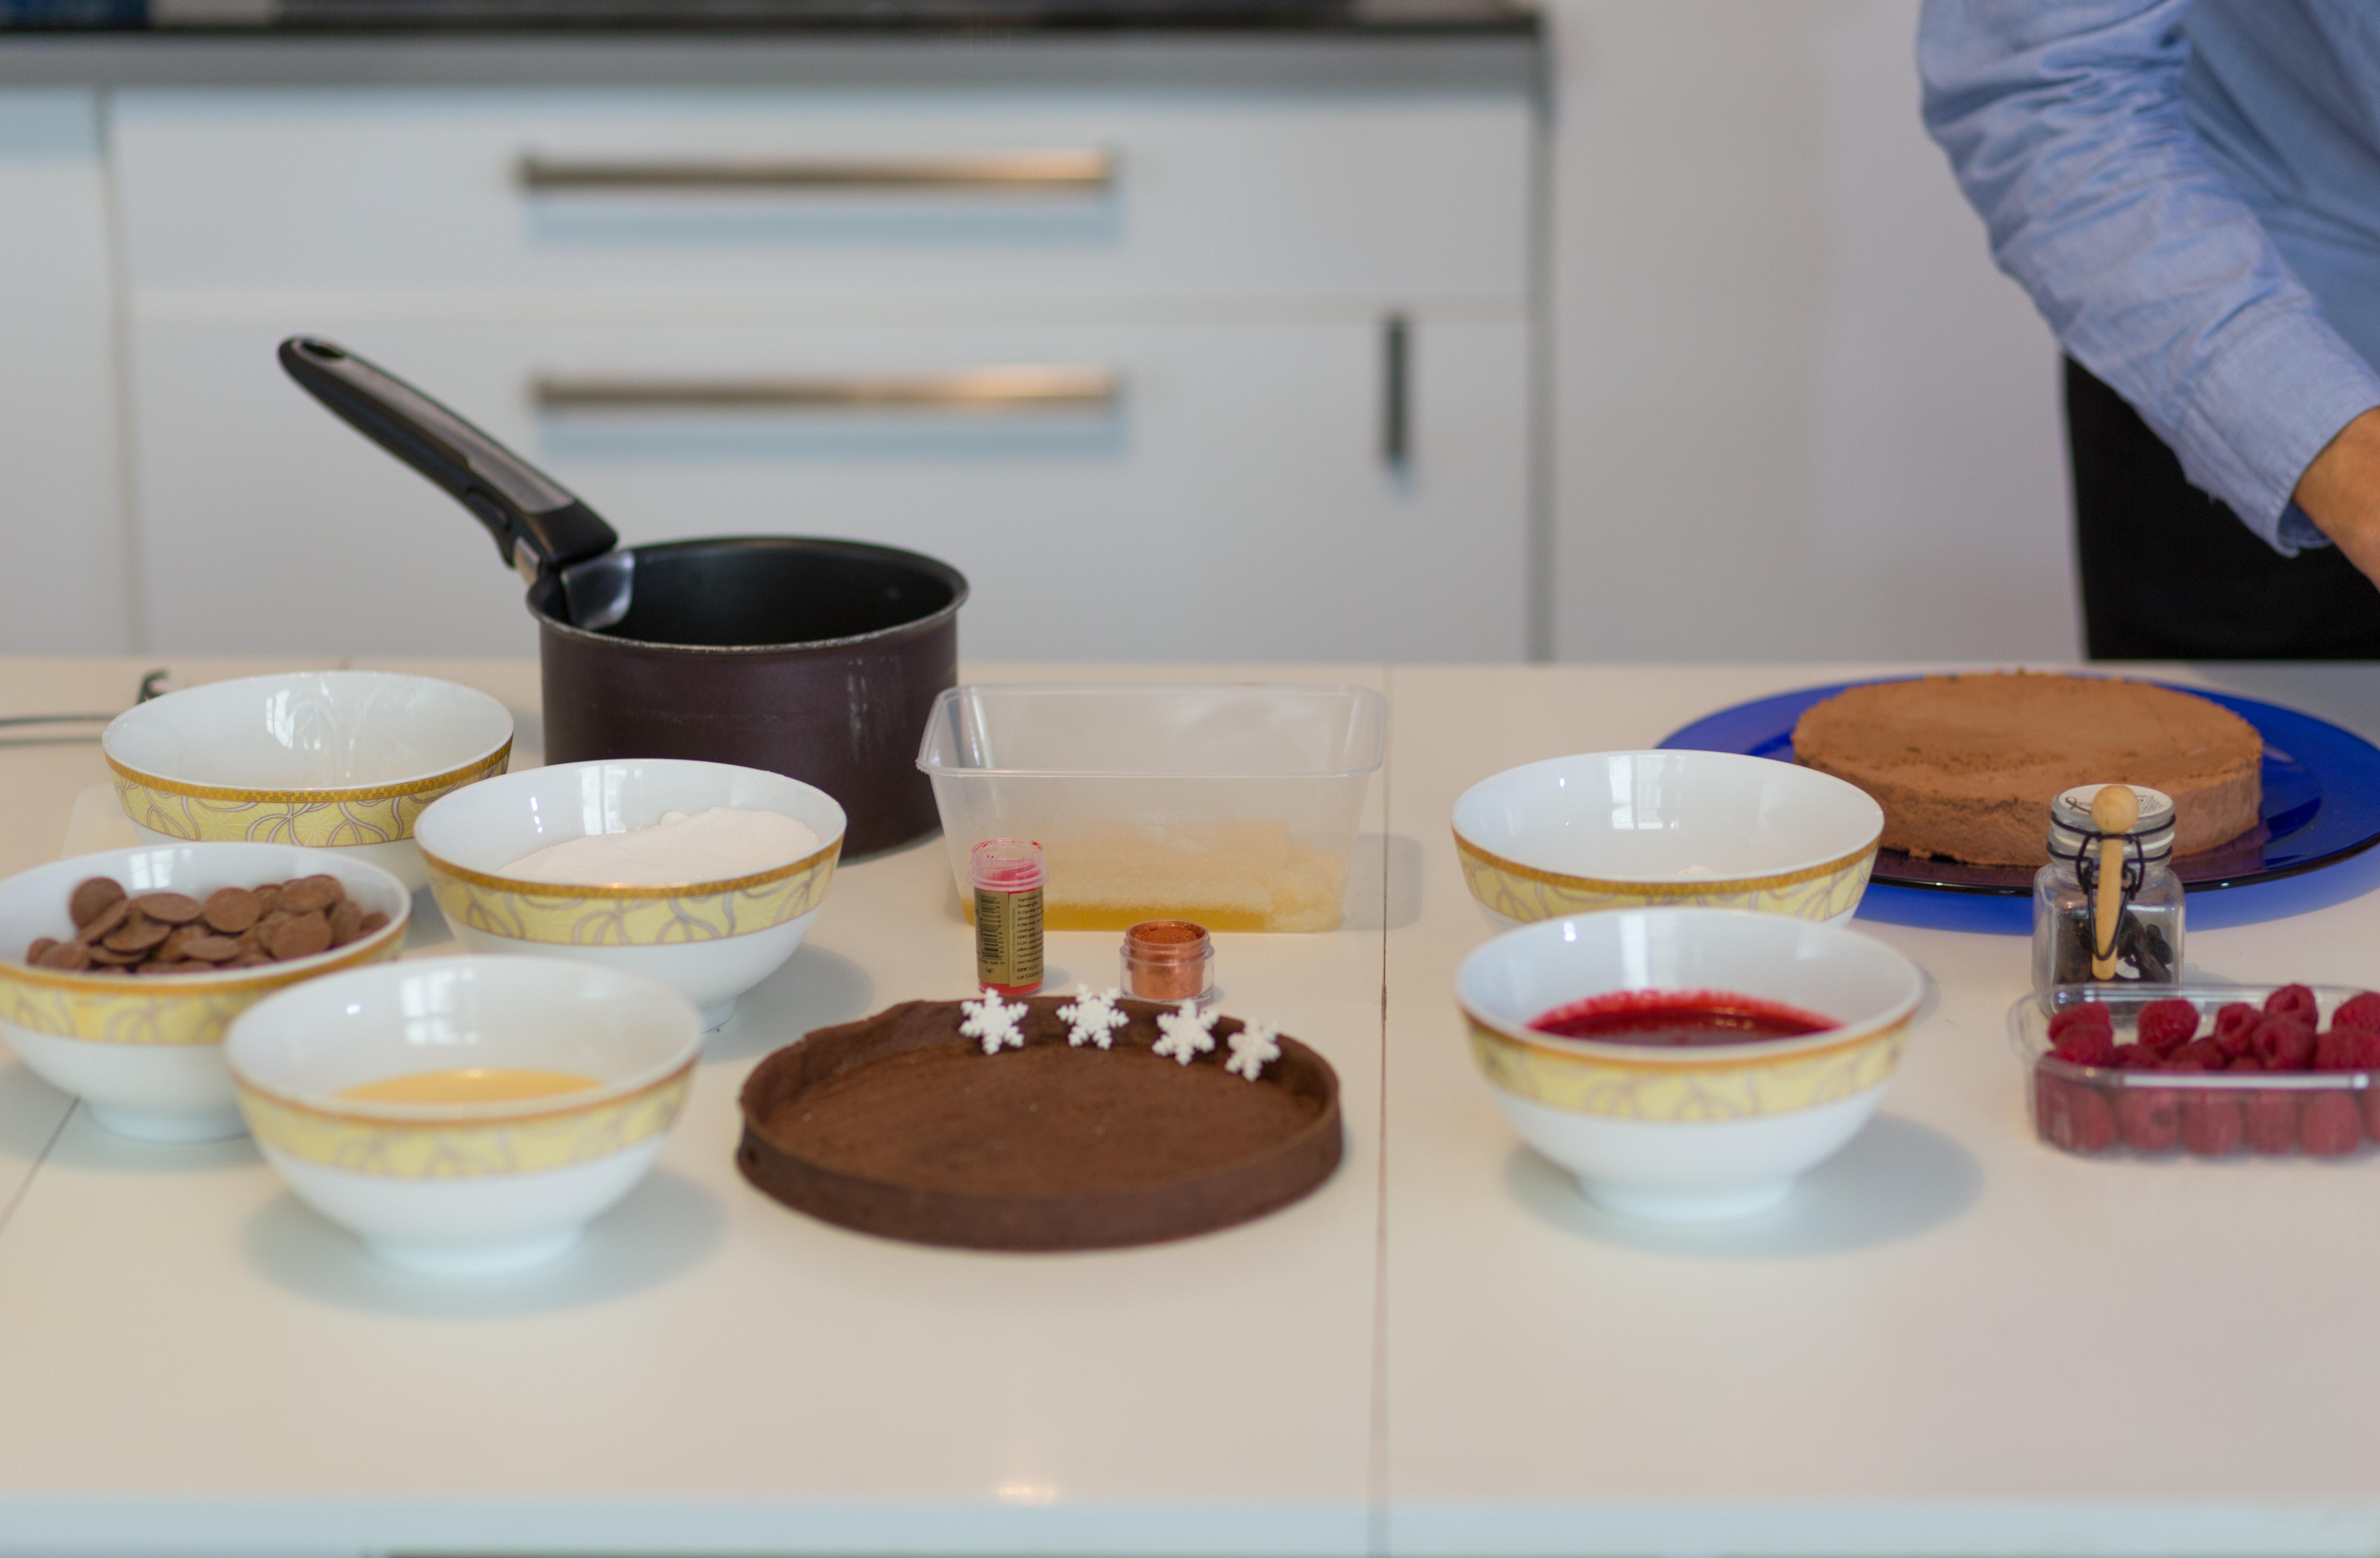 Sug Art Cake Design Montpellier : La tarte miroir chocolat et framboise par Sug art, Cake ...